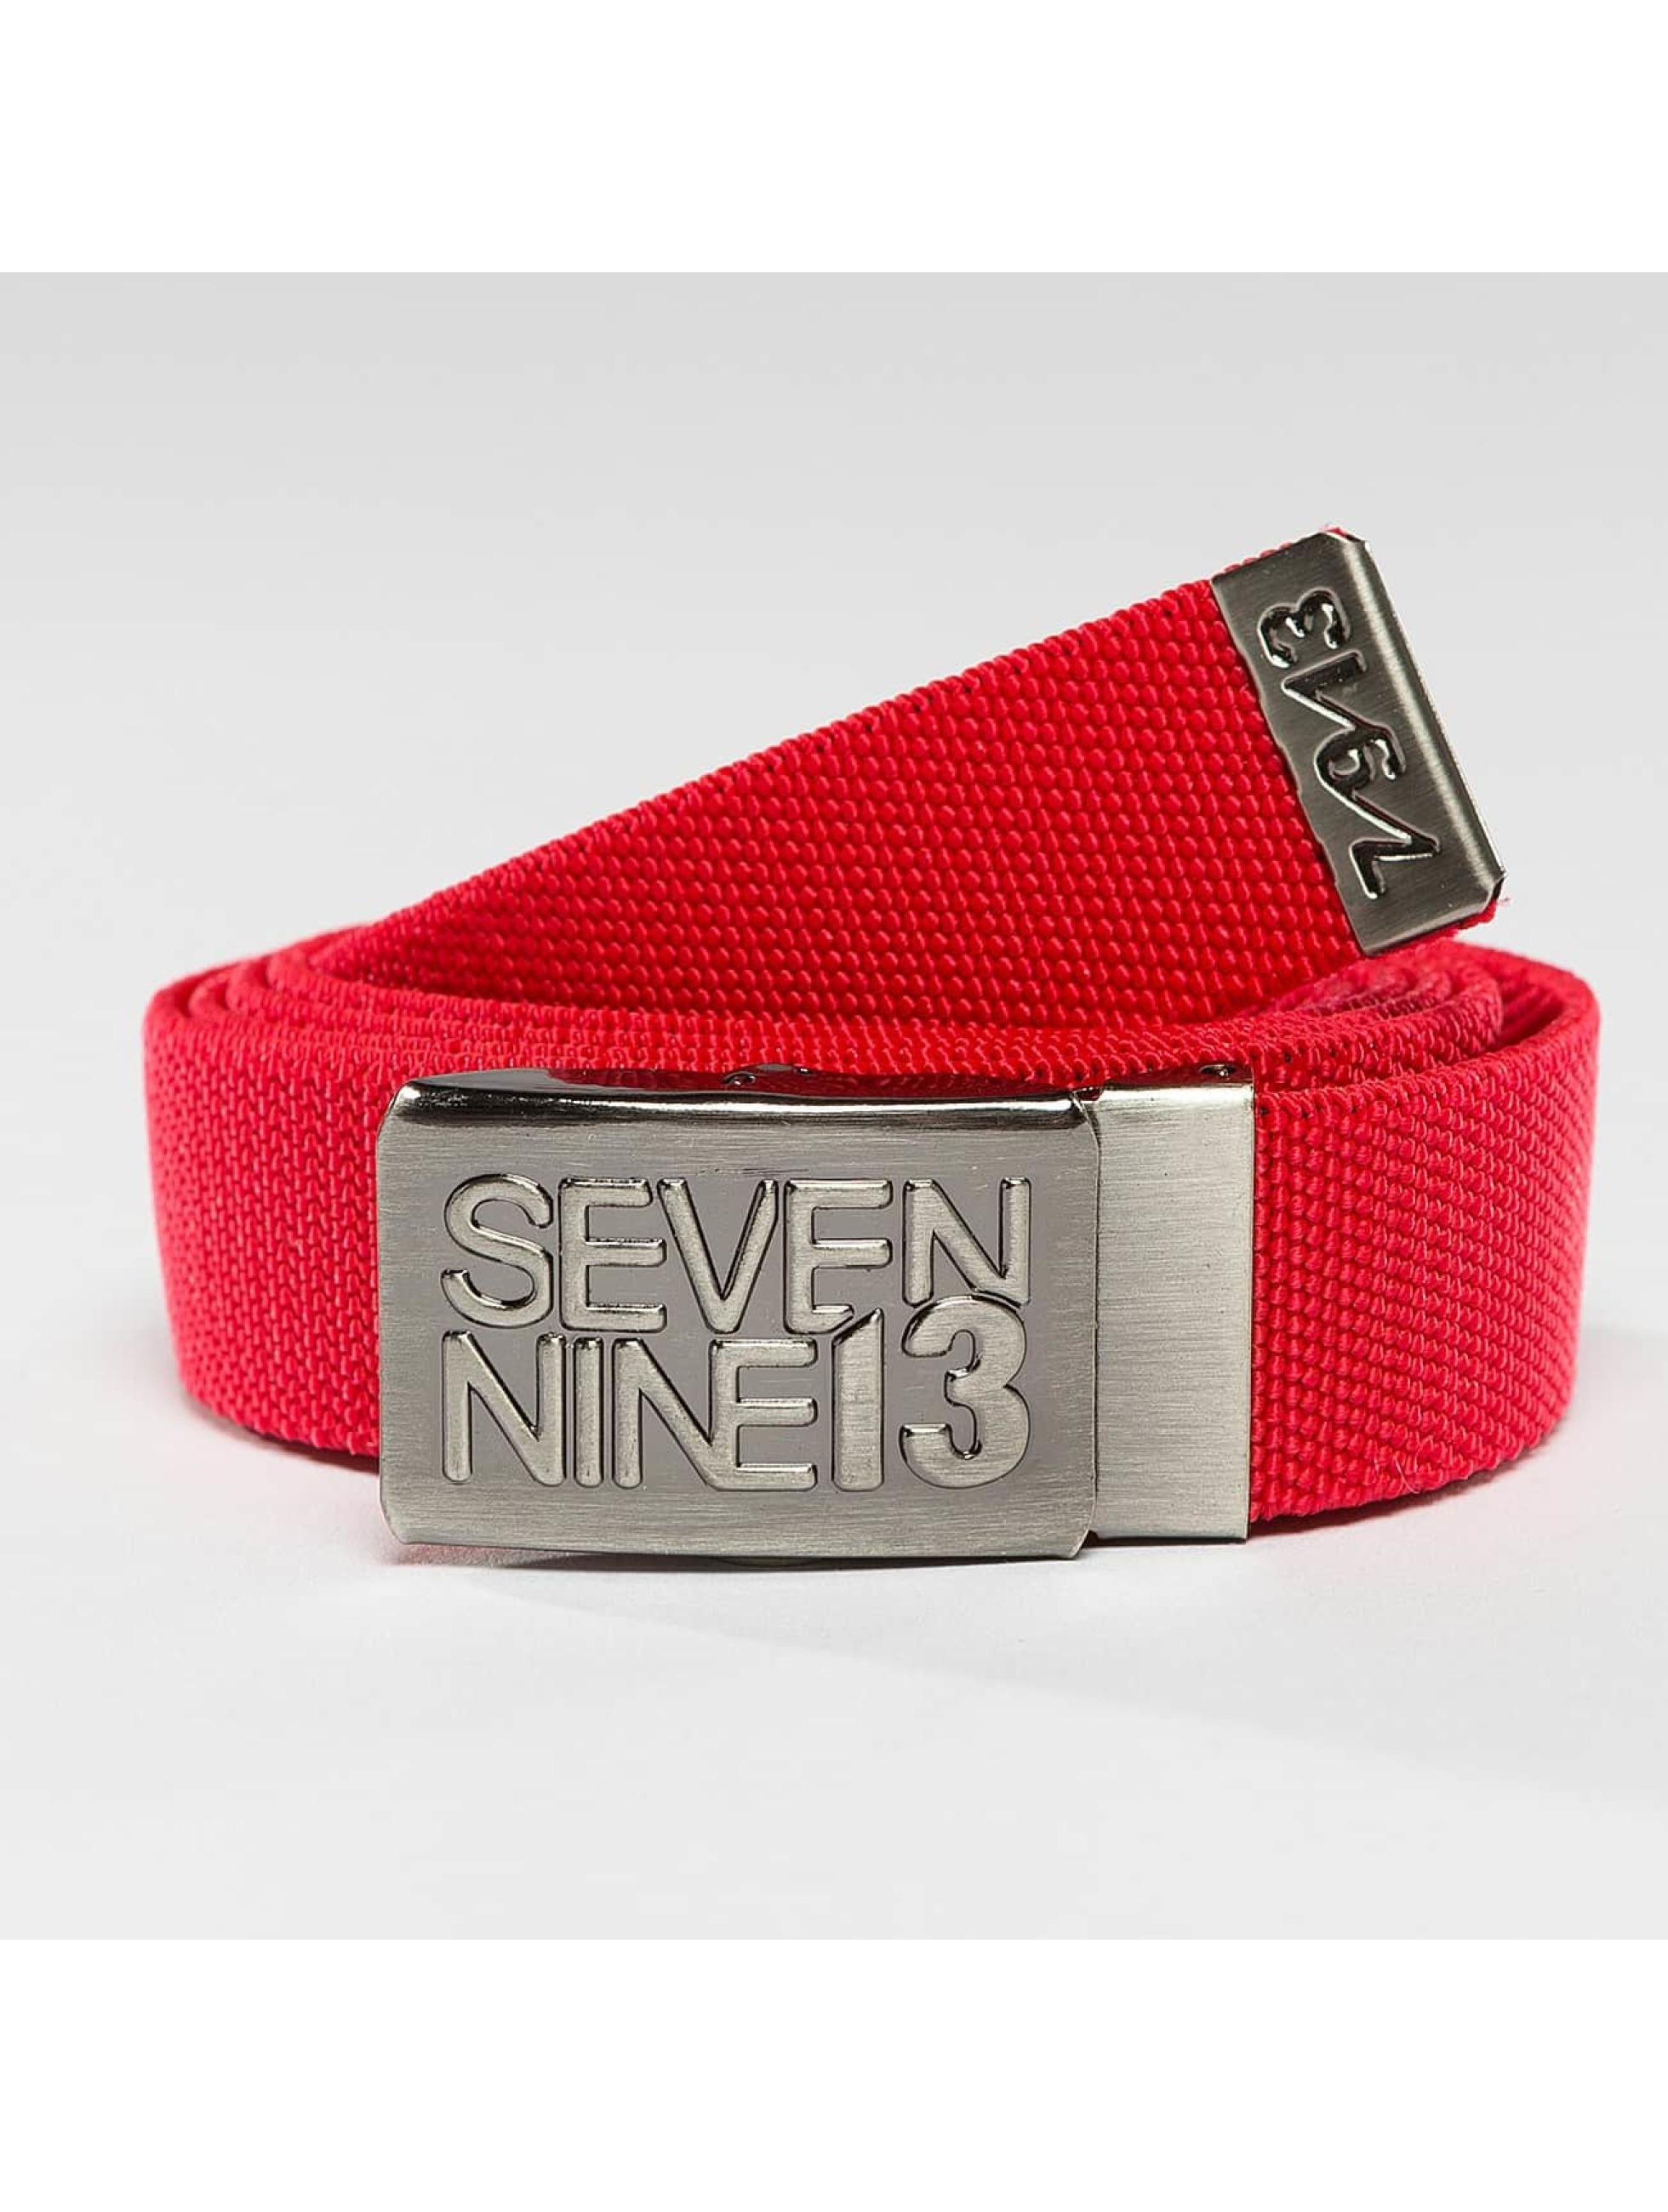 Seven Nine 13 Vyöt Jaws Stretch punainen